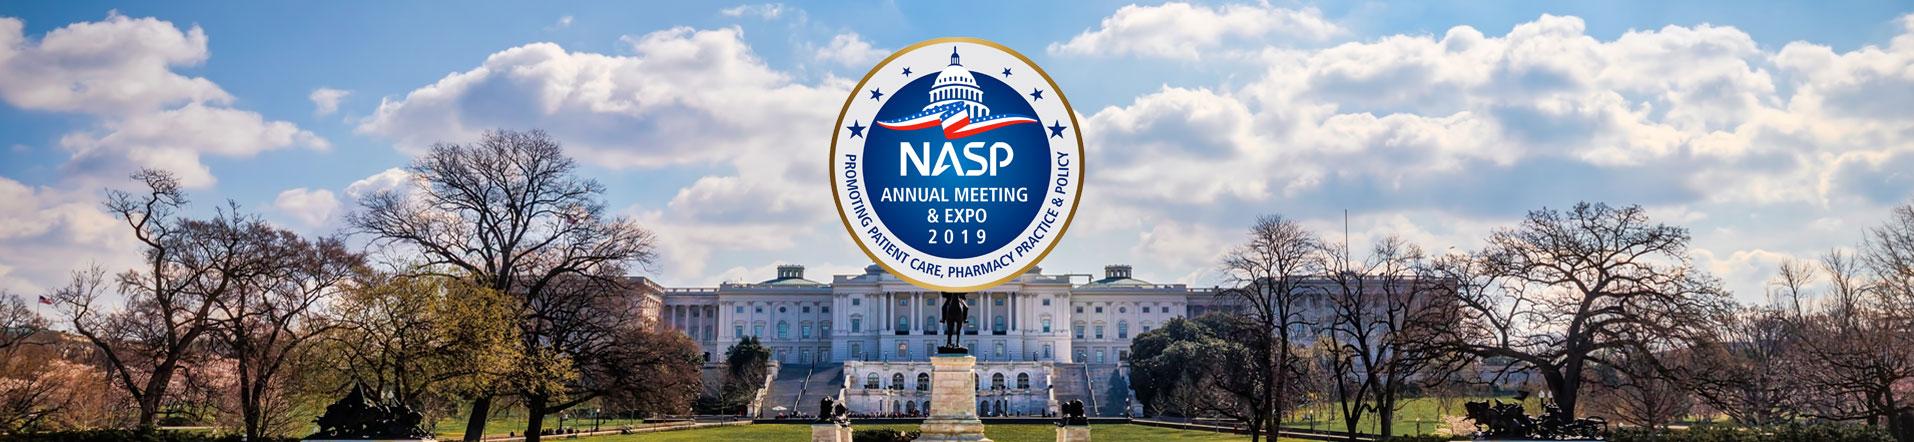 National Association of Specialty Pharmacy 2019 - Satellite Symposia